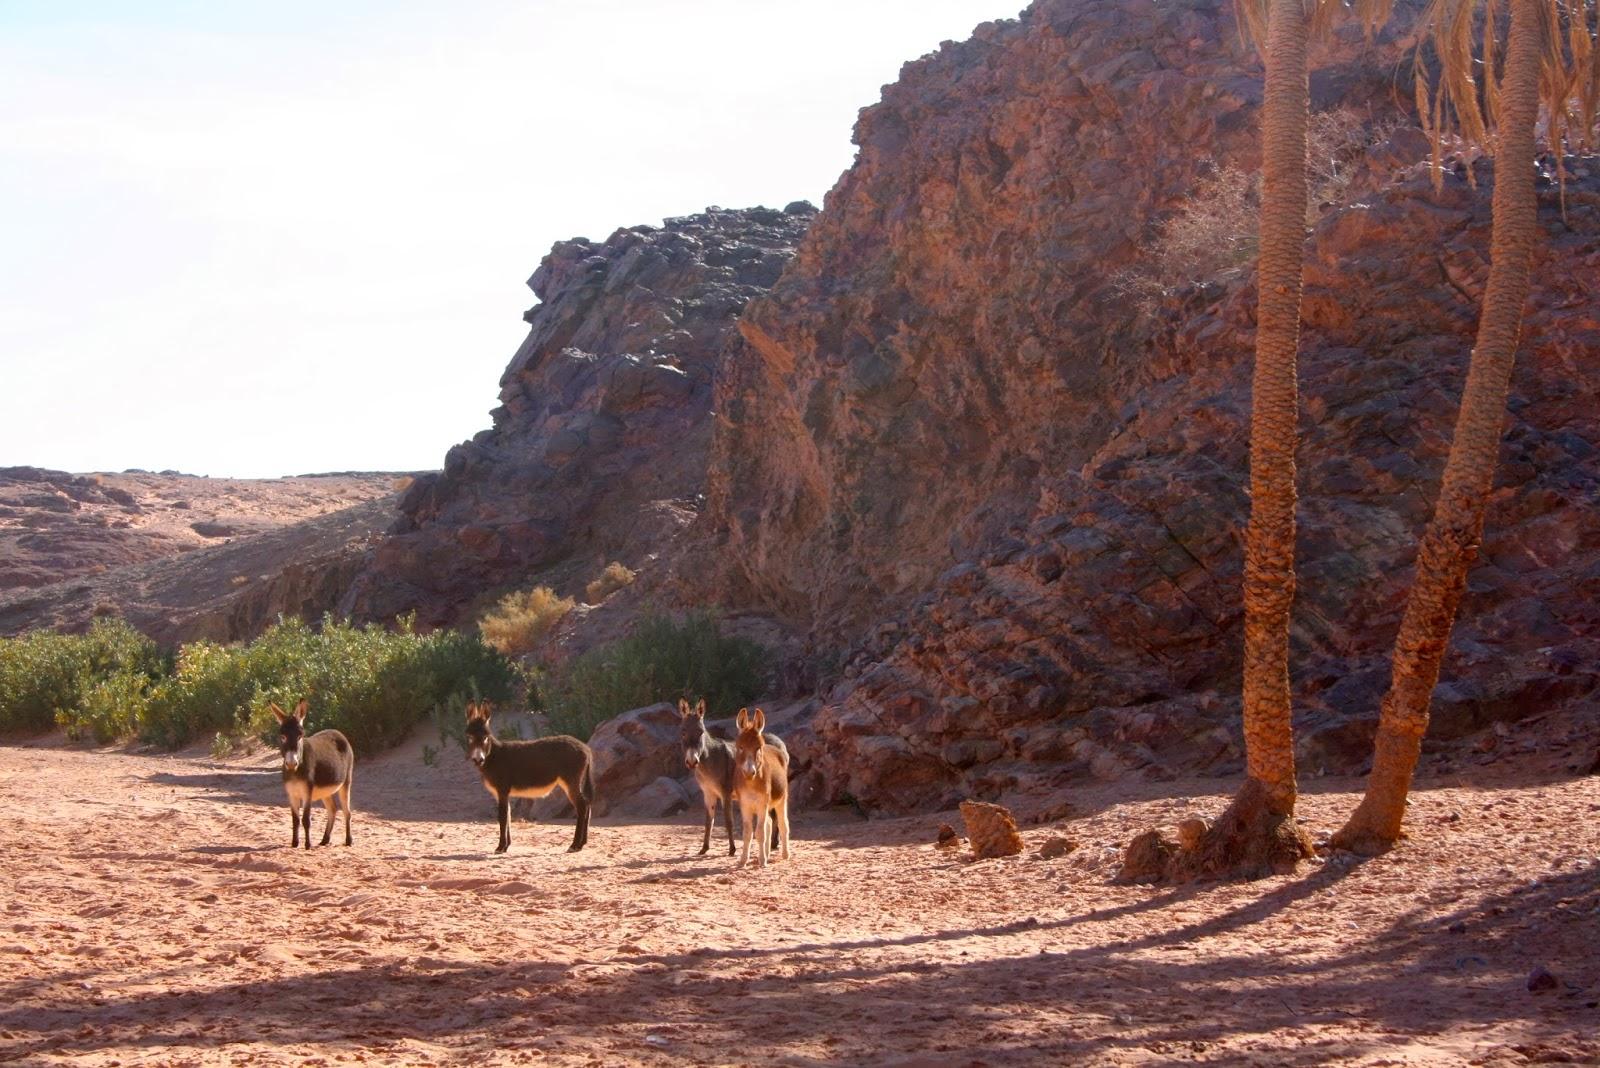 viajes al desierto, aventura, viajes a marruecos, marrakech, fez, arfoud, merzouga